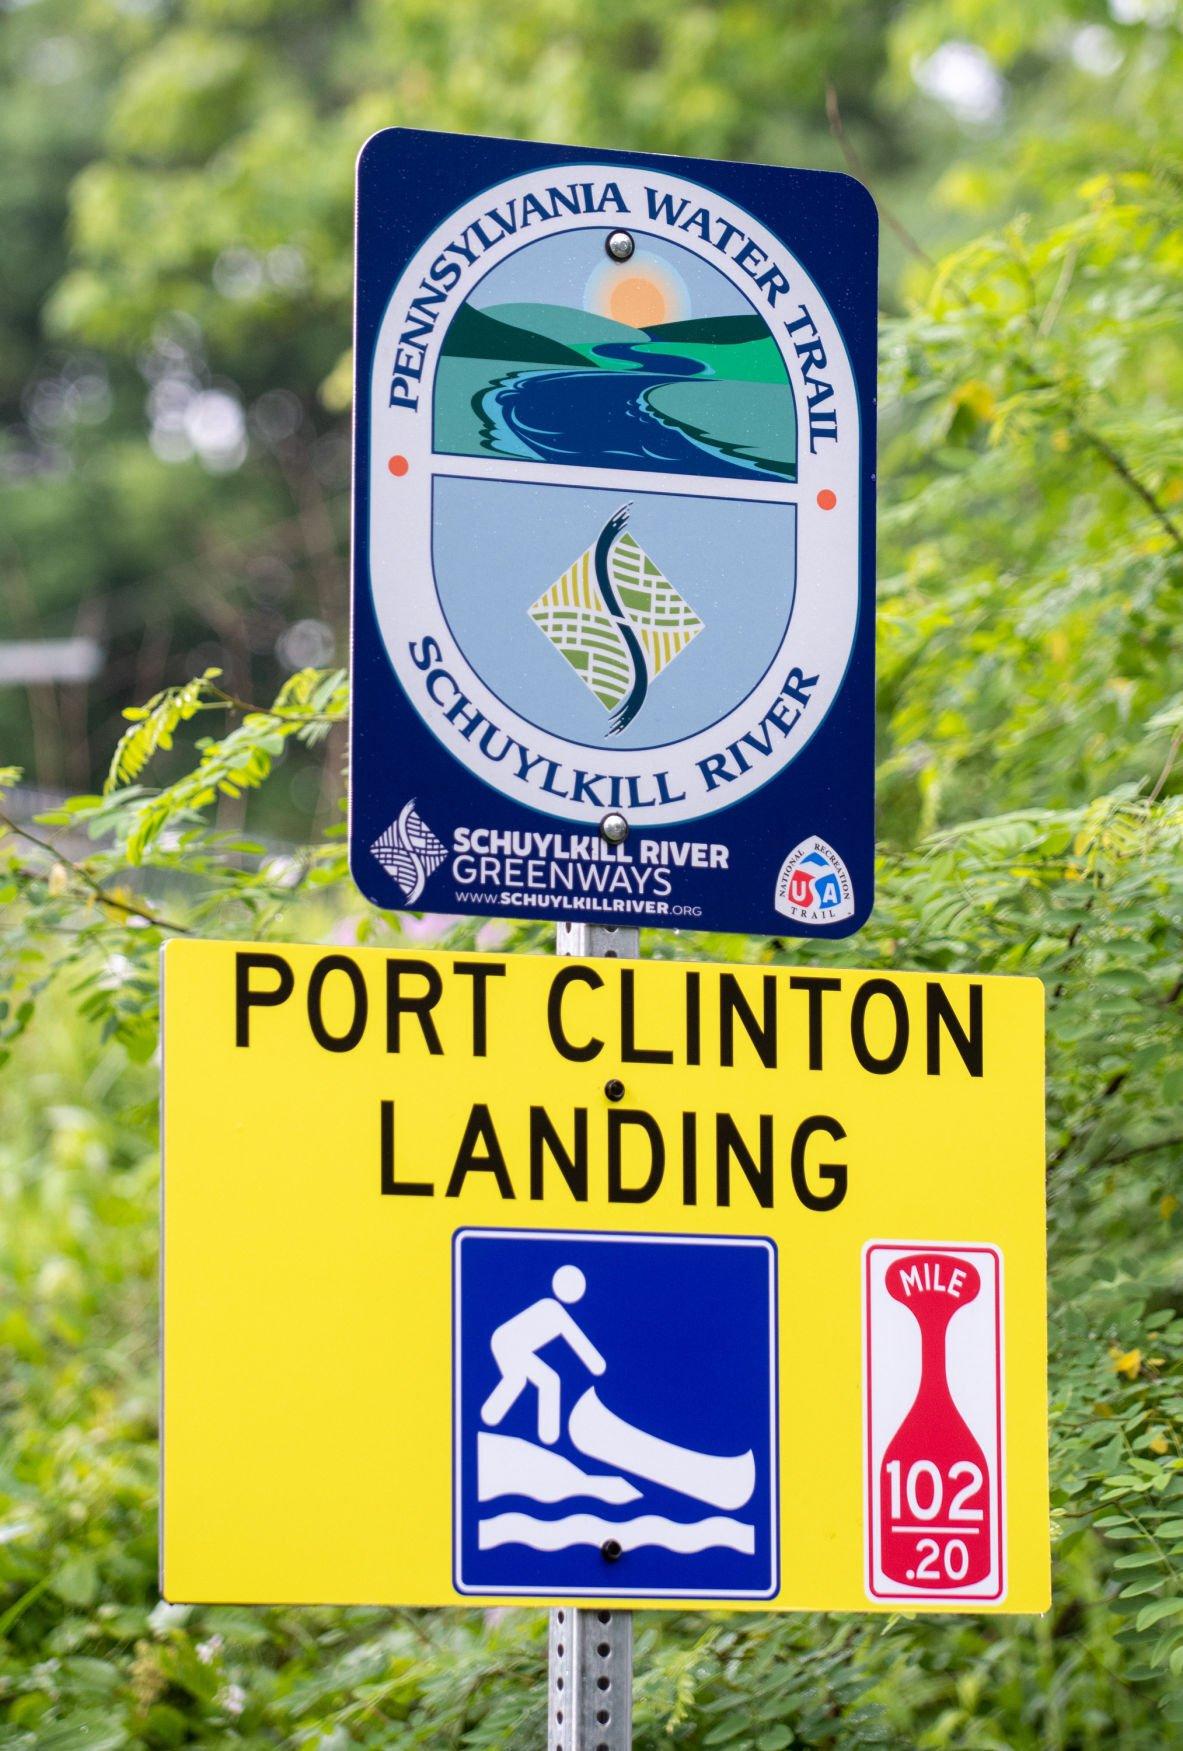 Port Clinton Ribbon cutting